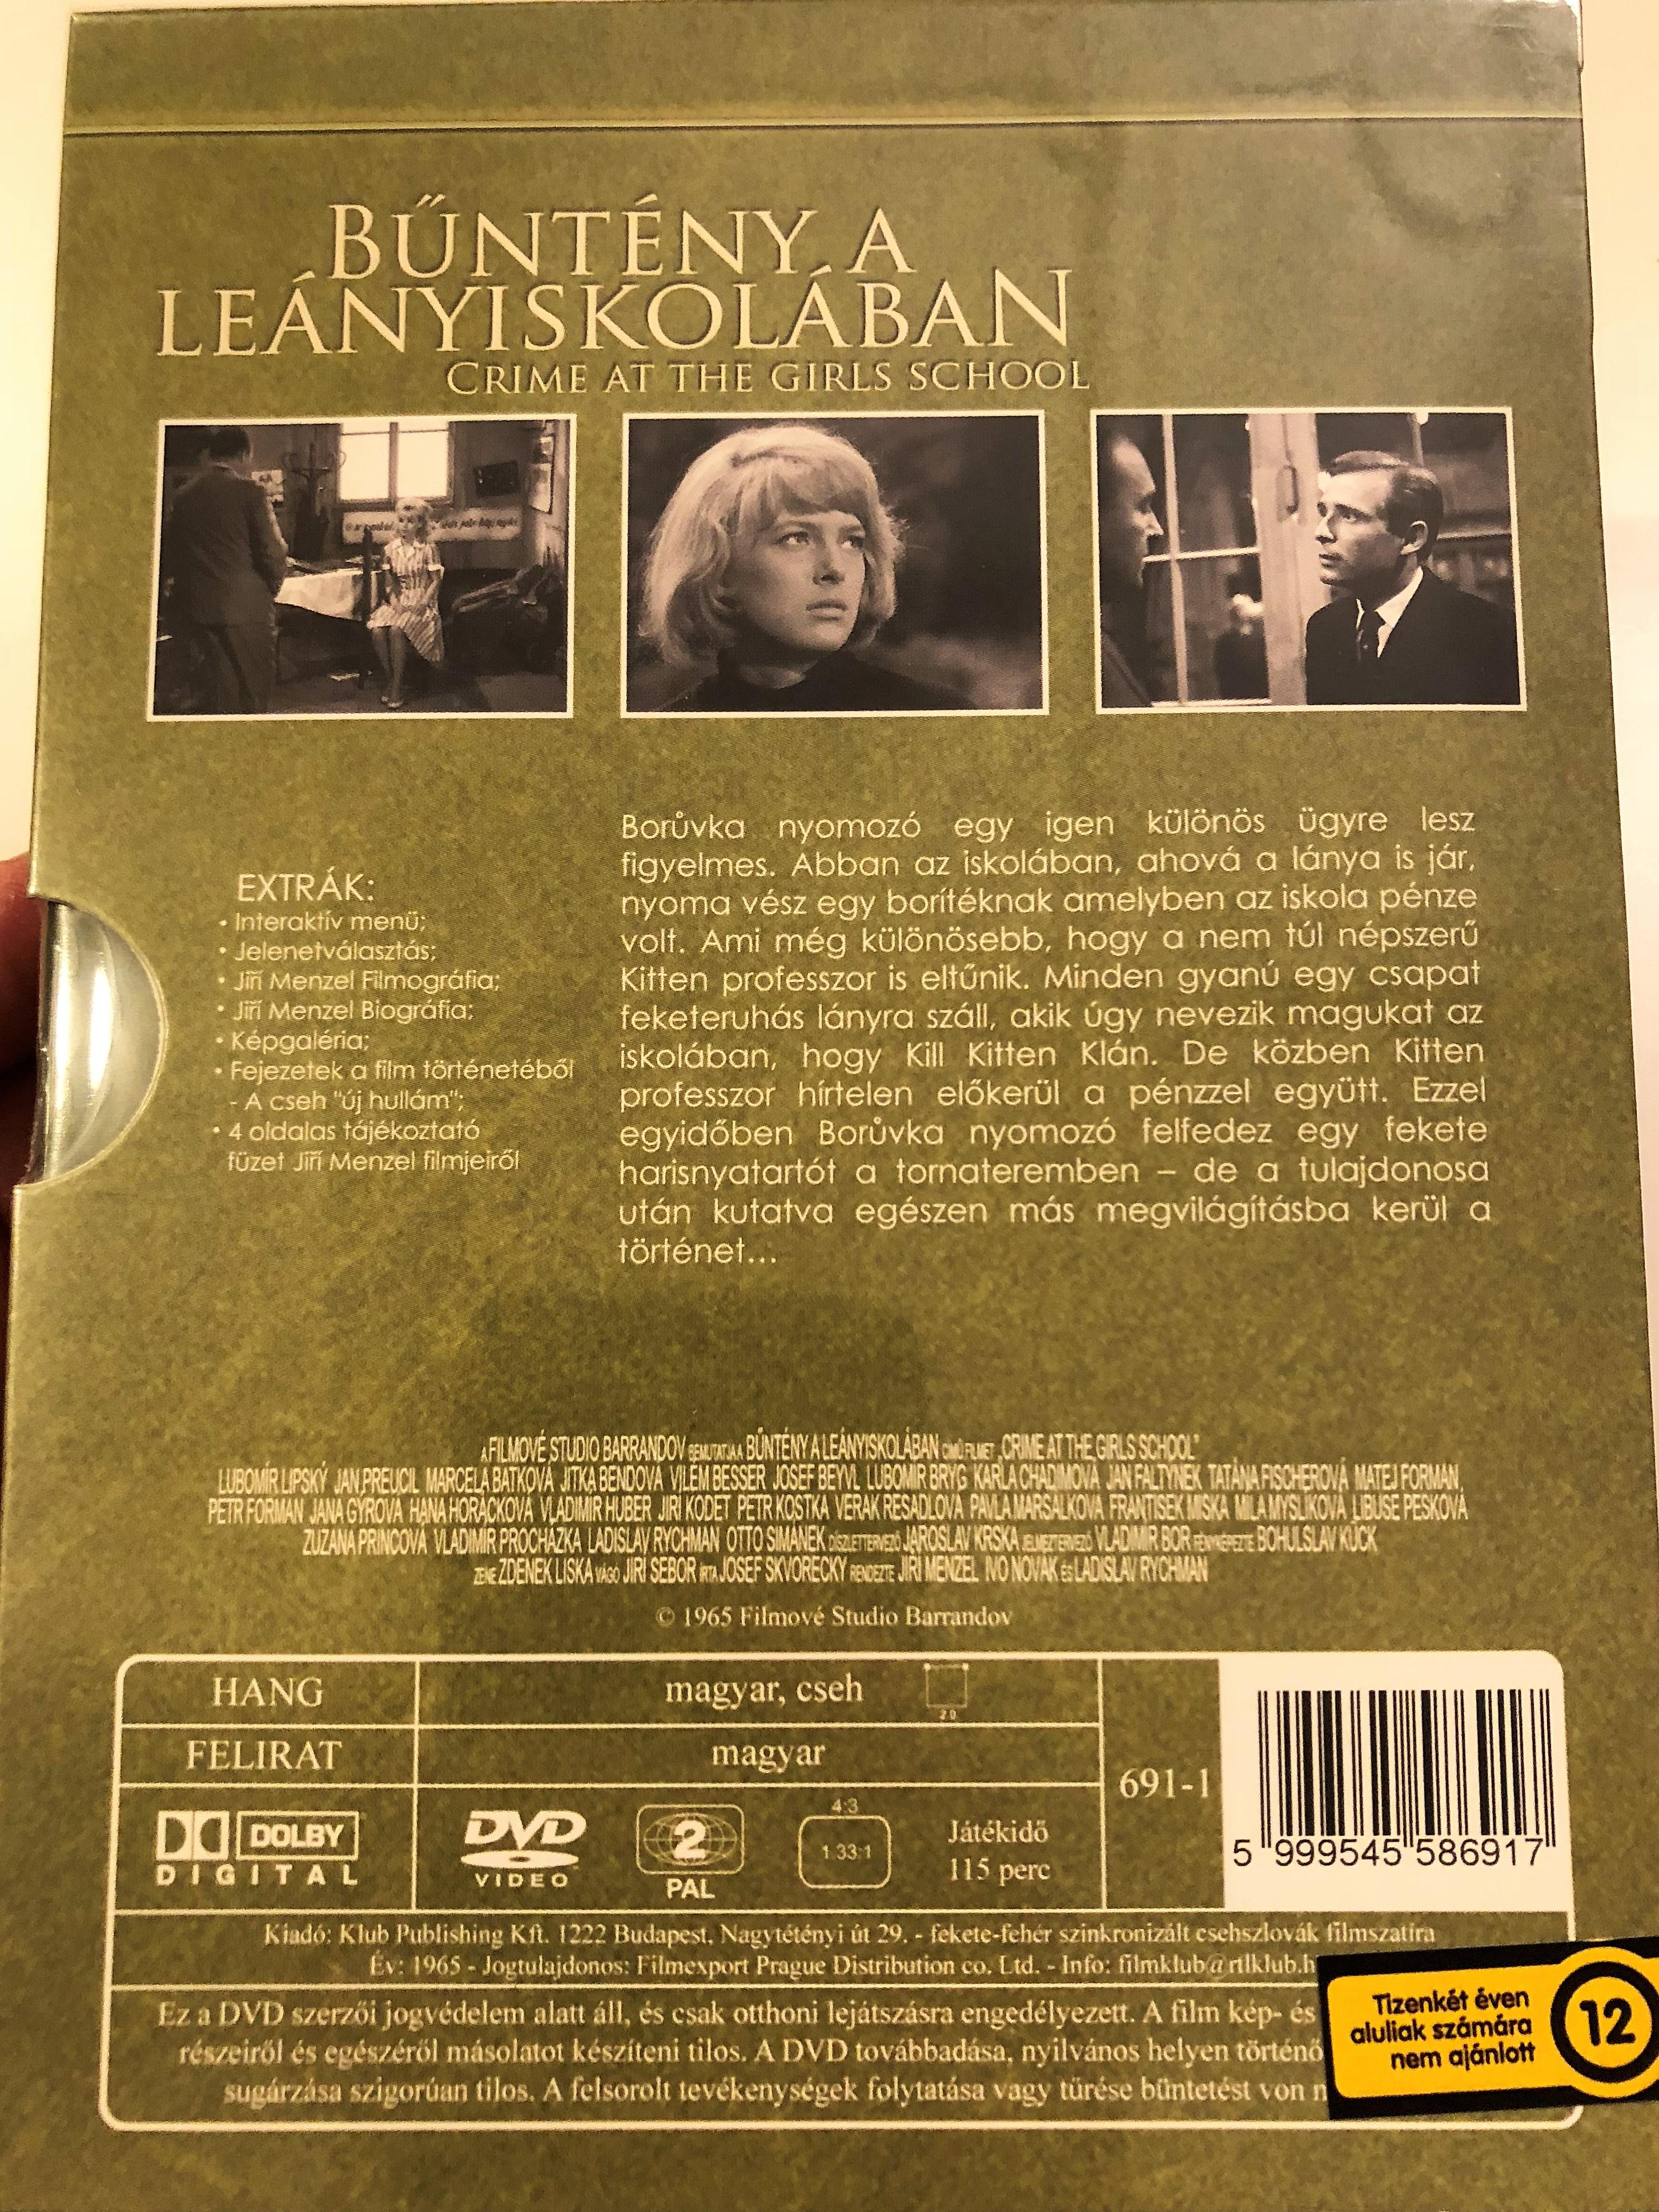 crime-at-the-girls-school-zlo-in-v-d-v-kole-dvd-1968-b-nt-ny-a-le-nyiskol-ban-directed-by-ji-menzel-starring-lubom-r-lipsky-jan-preucil-marcela-batkov-jitka-bendov-2-.jpg